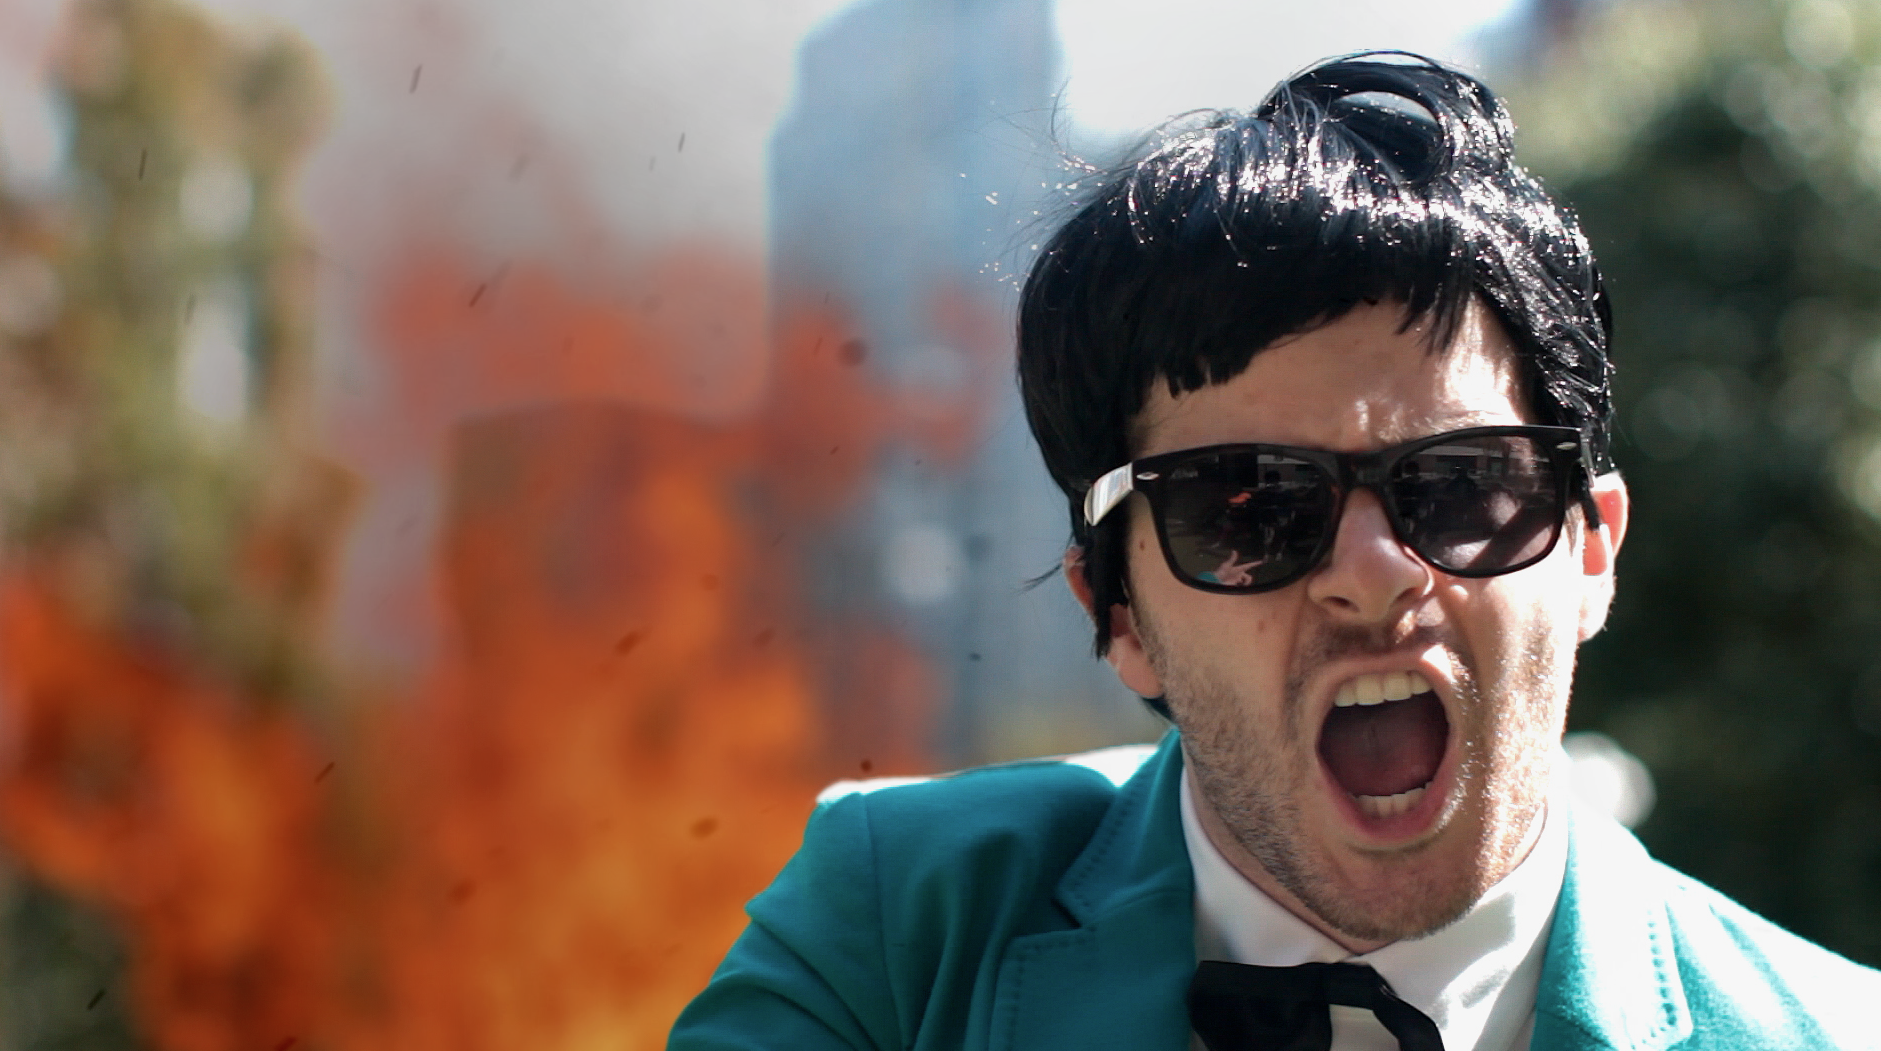 Psy Gangnam Style Parody by HubSpot